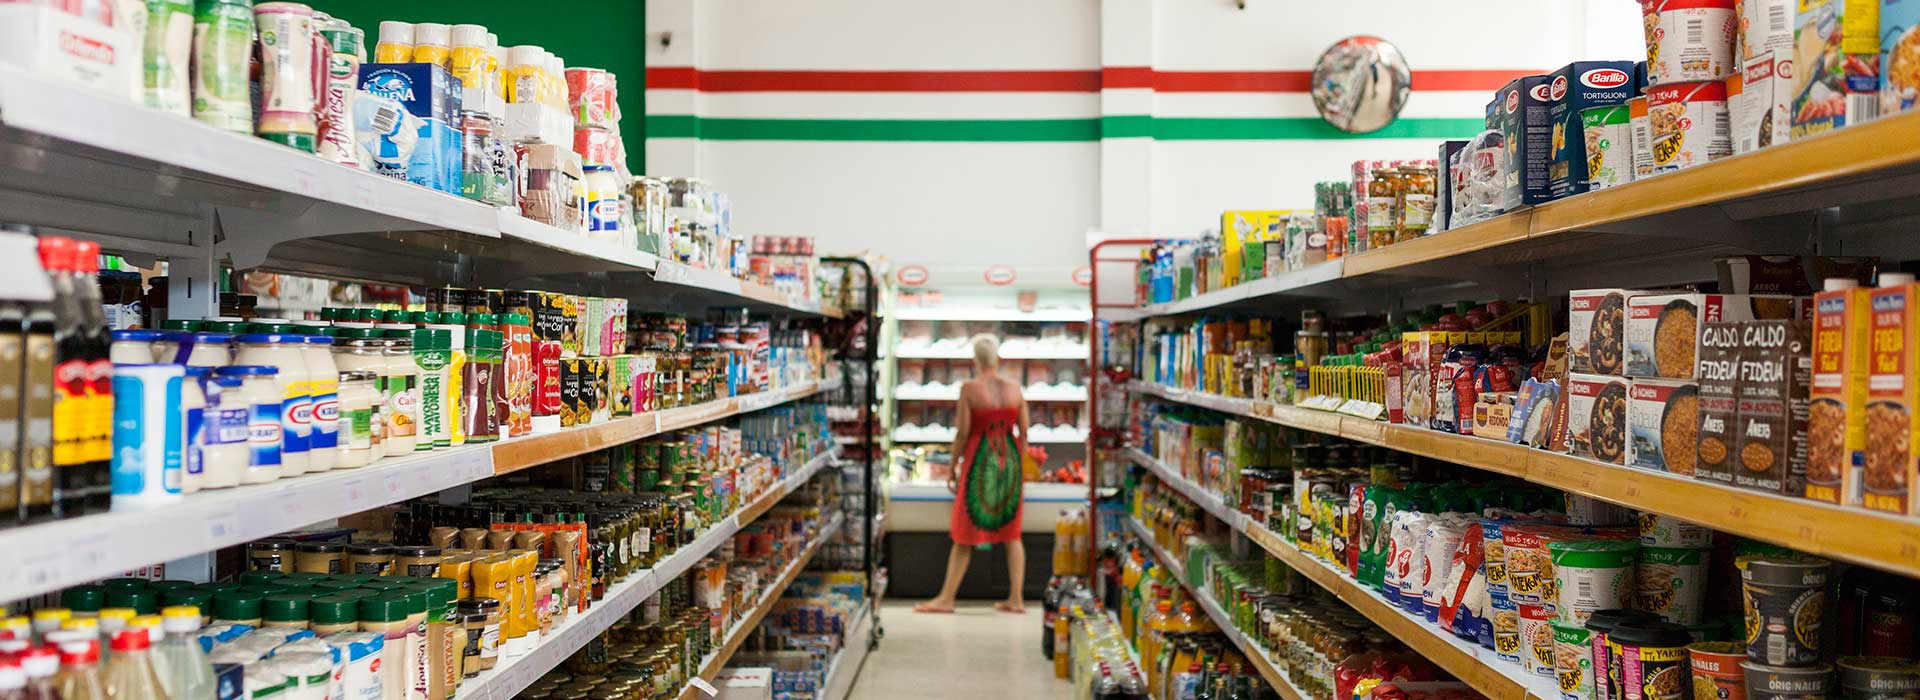 Supermercado 1